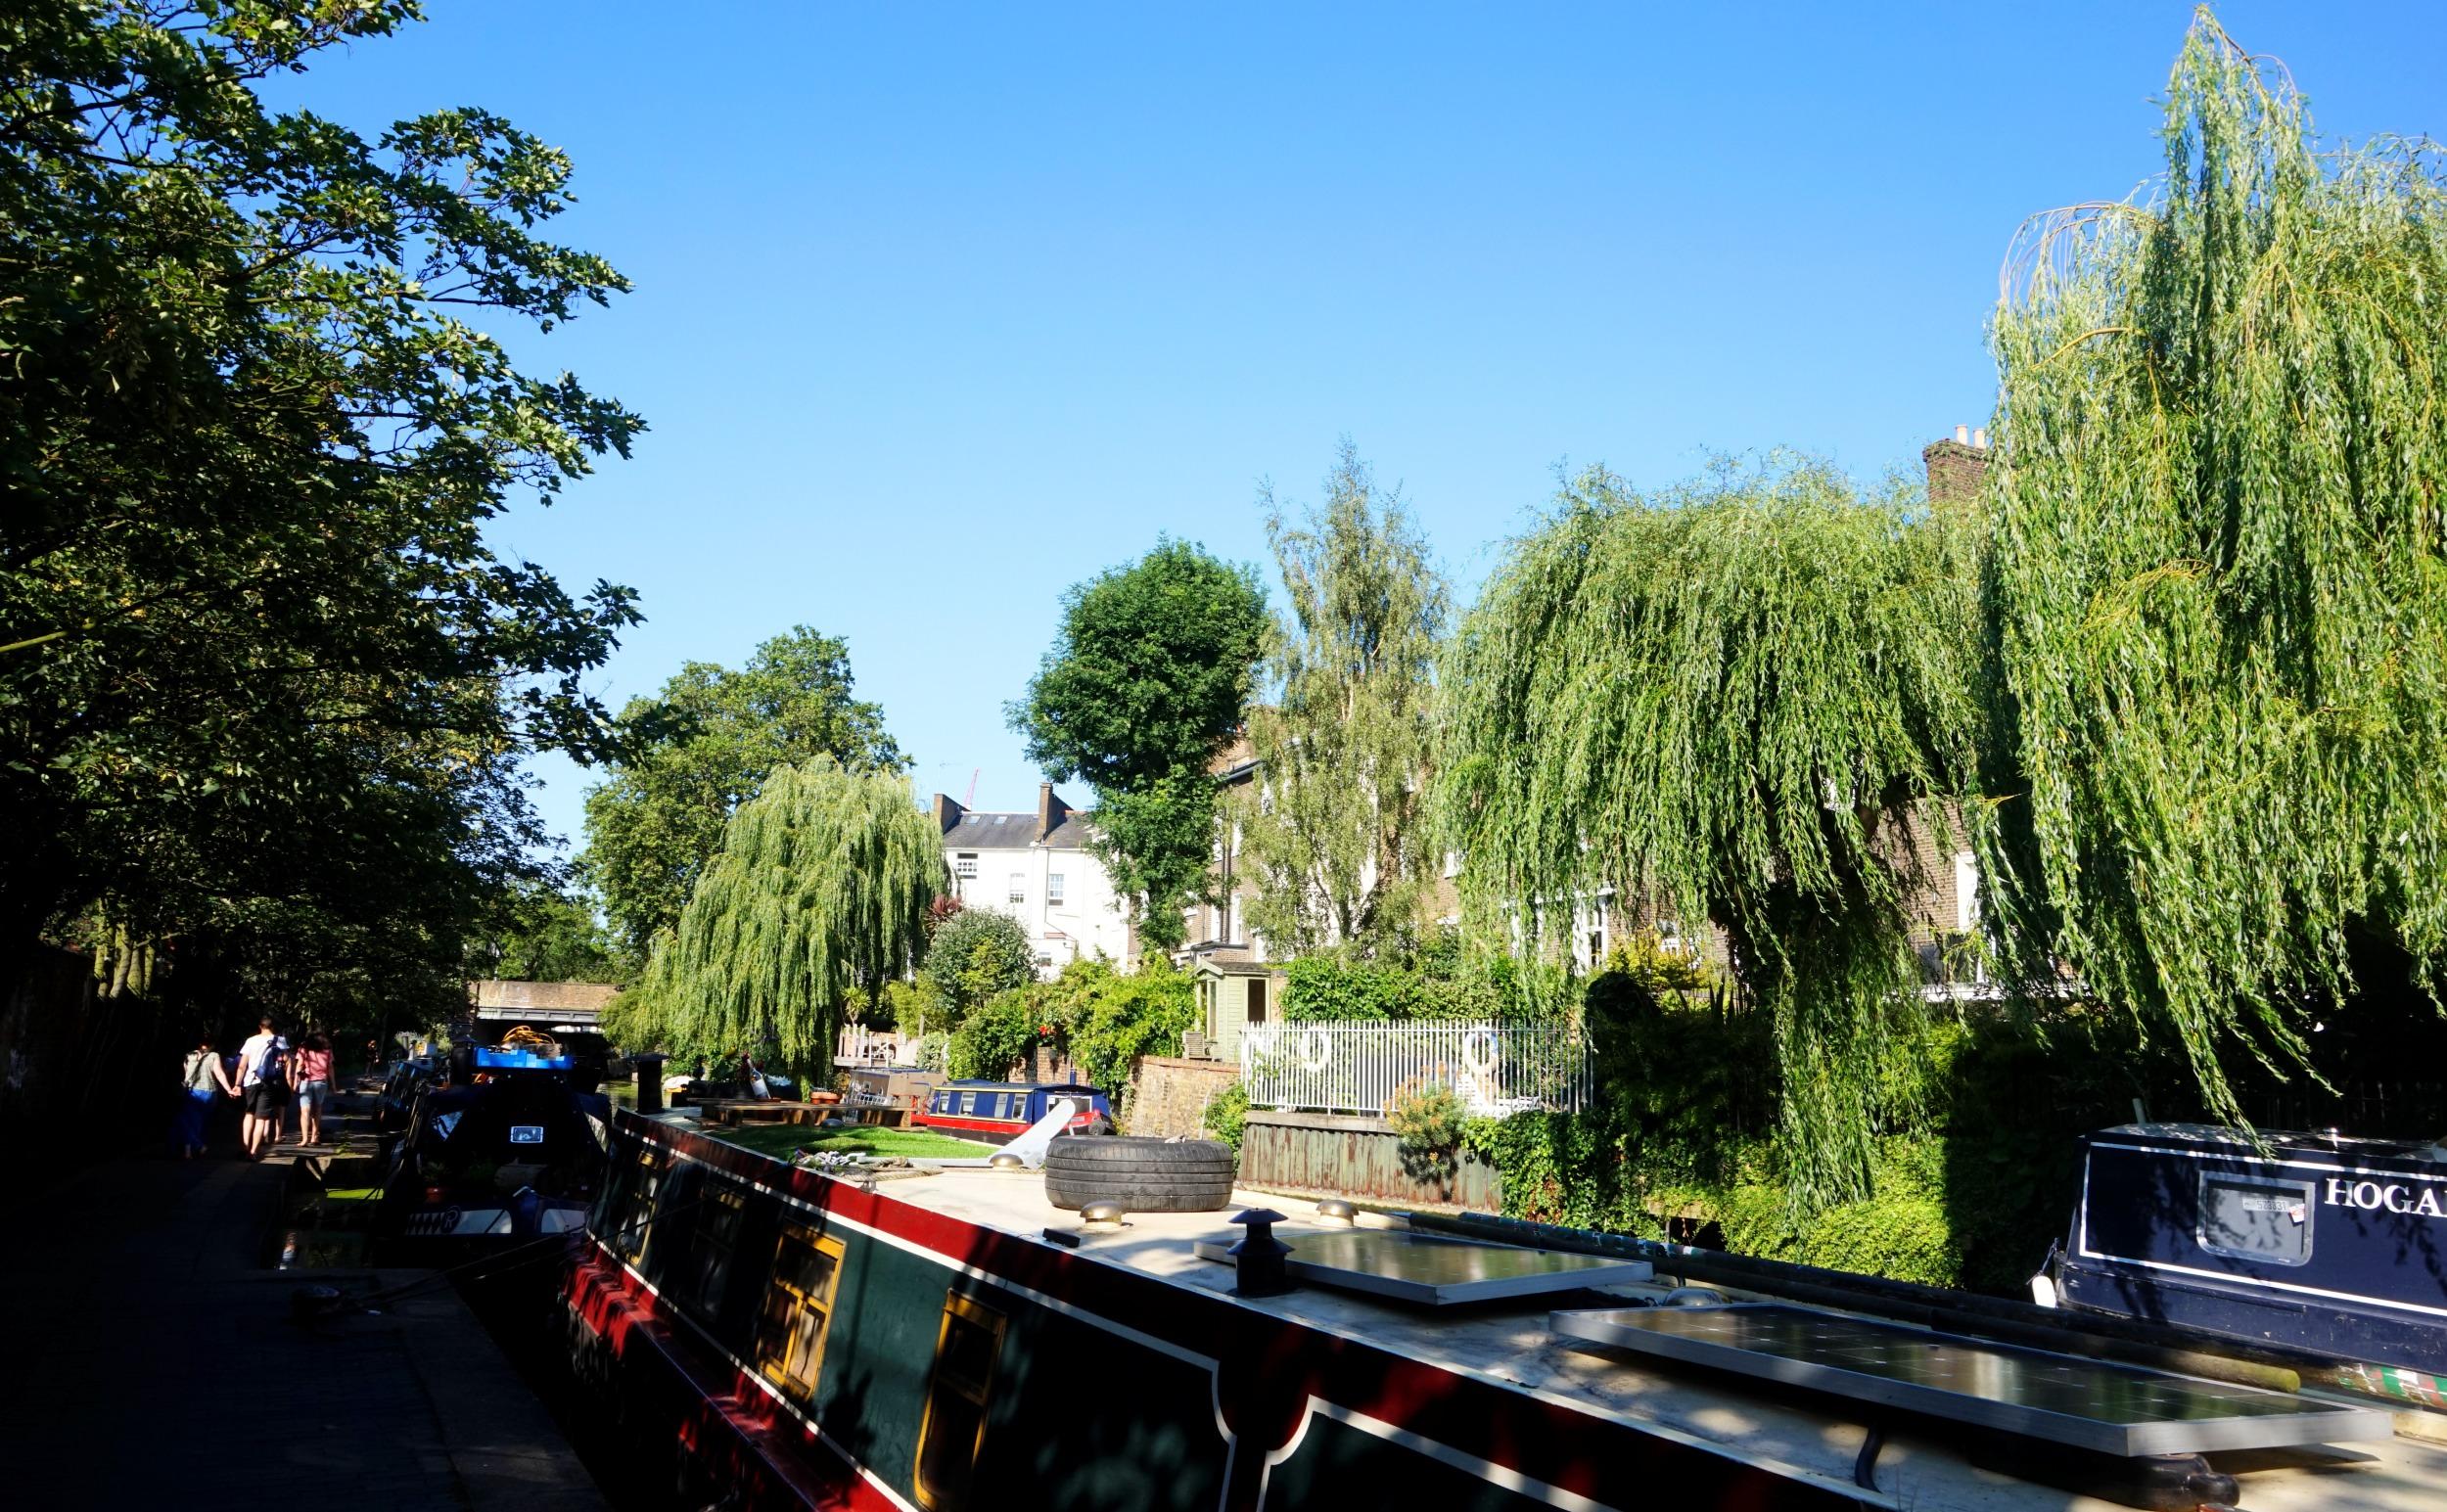 Regents-Canal-53